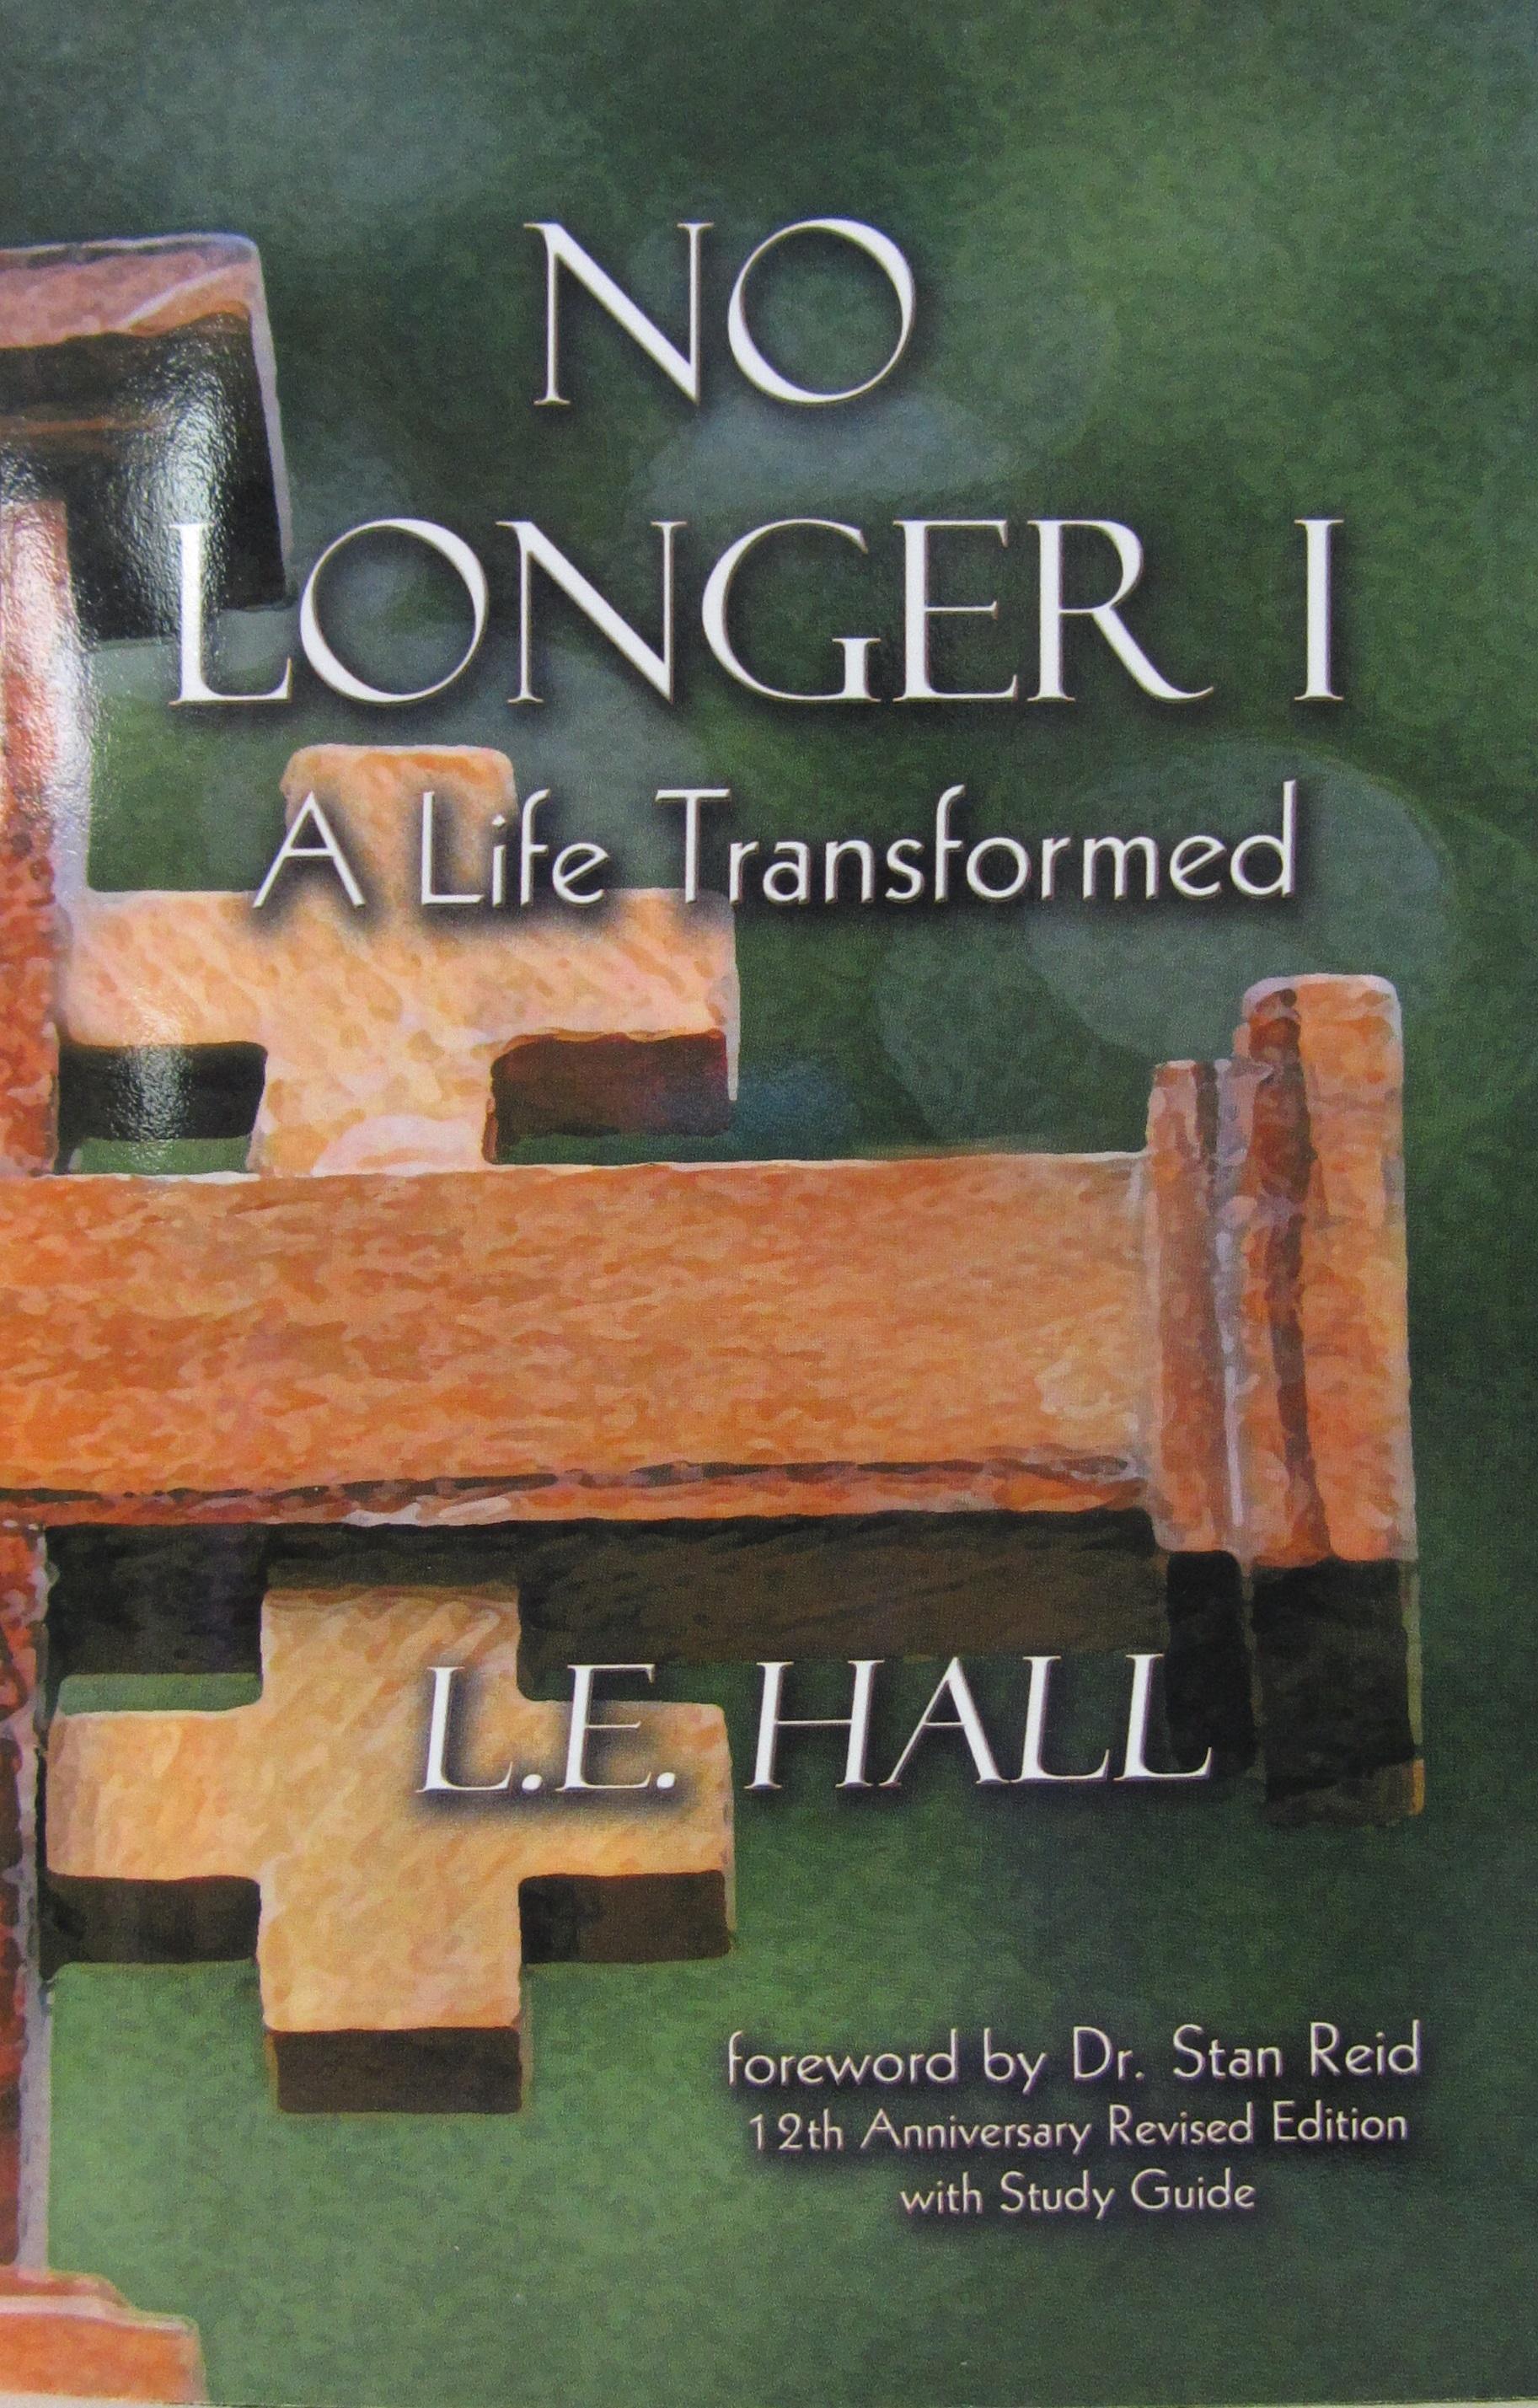 No+Longer+I+A+life+Transformed.jpg